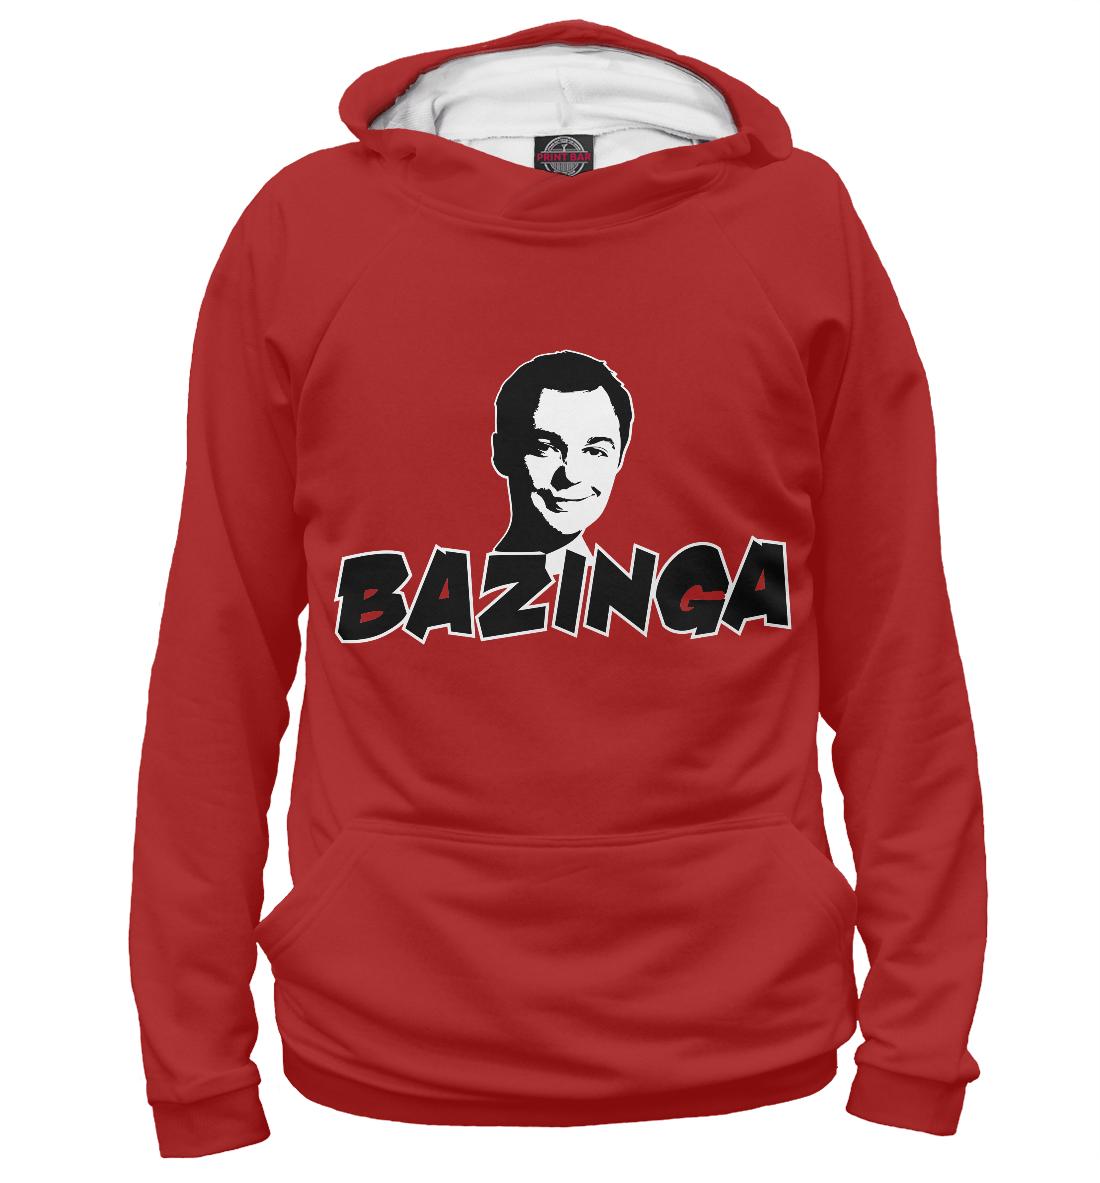 The Big Bang Theory, Printbar, Худи, TEO-837293-hud-2  - купить со скидкой